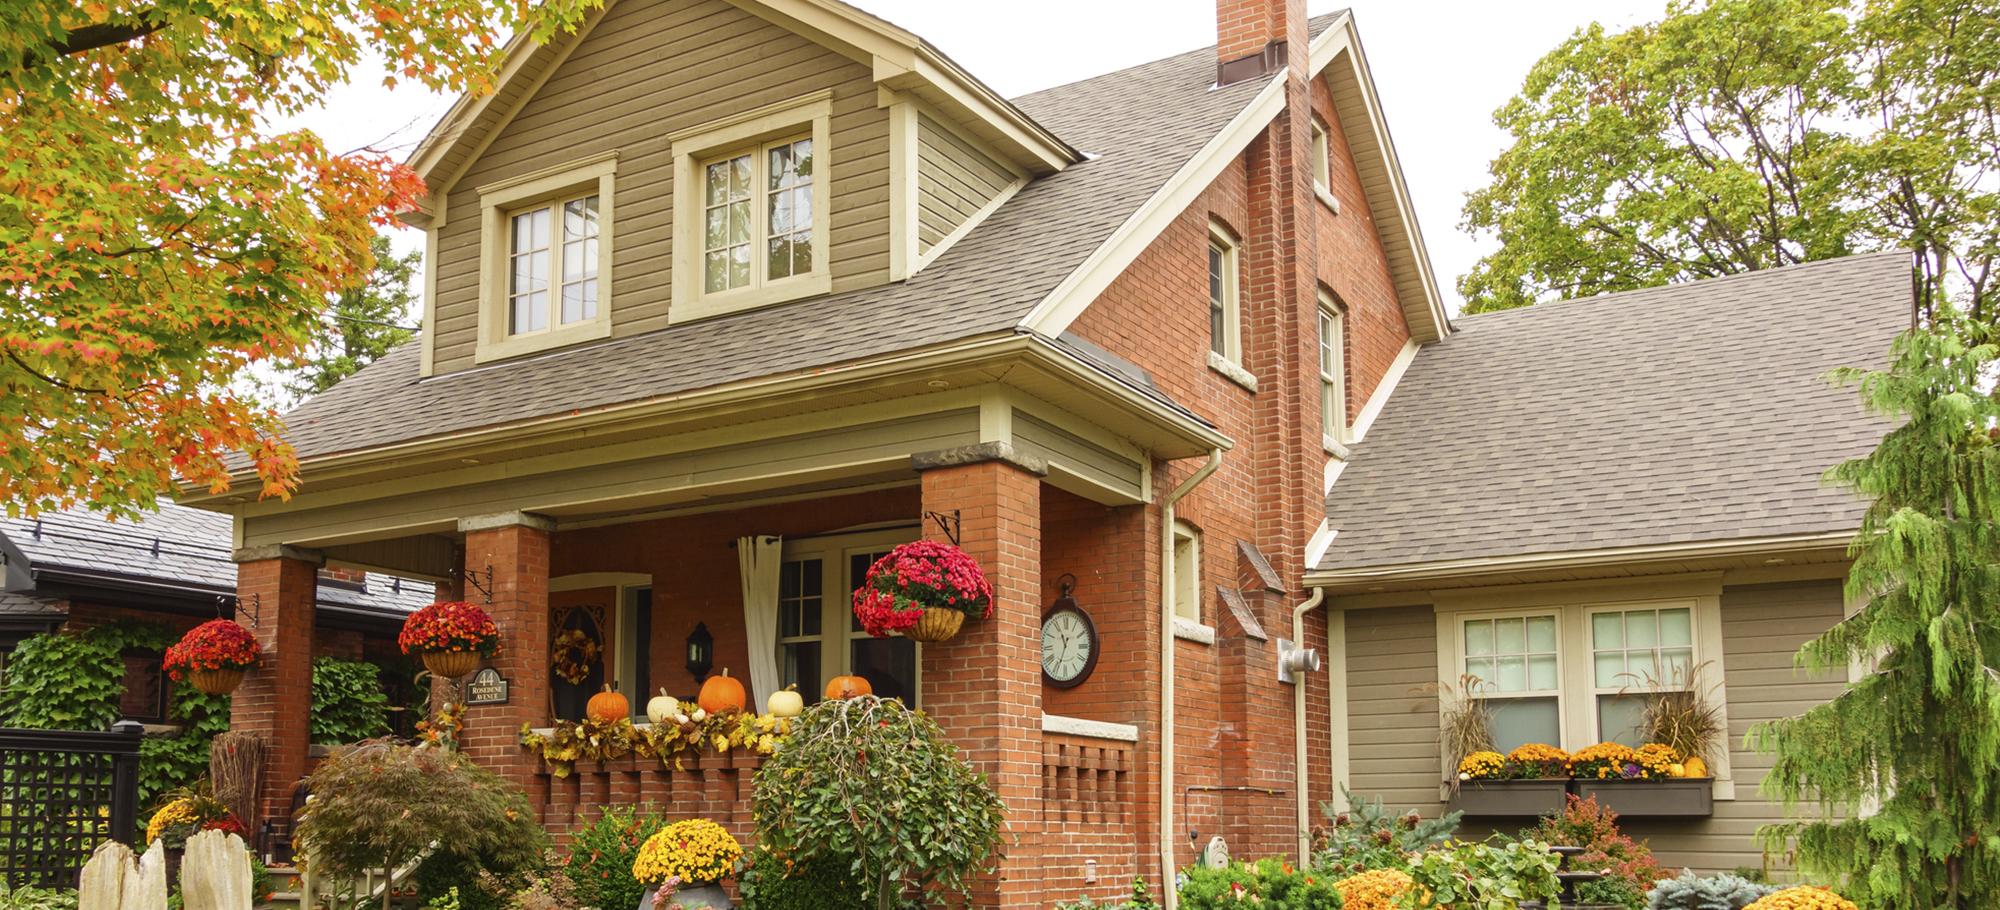 Fall Home Maintenance: Plumbing & Safety Checks